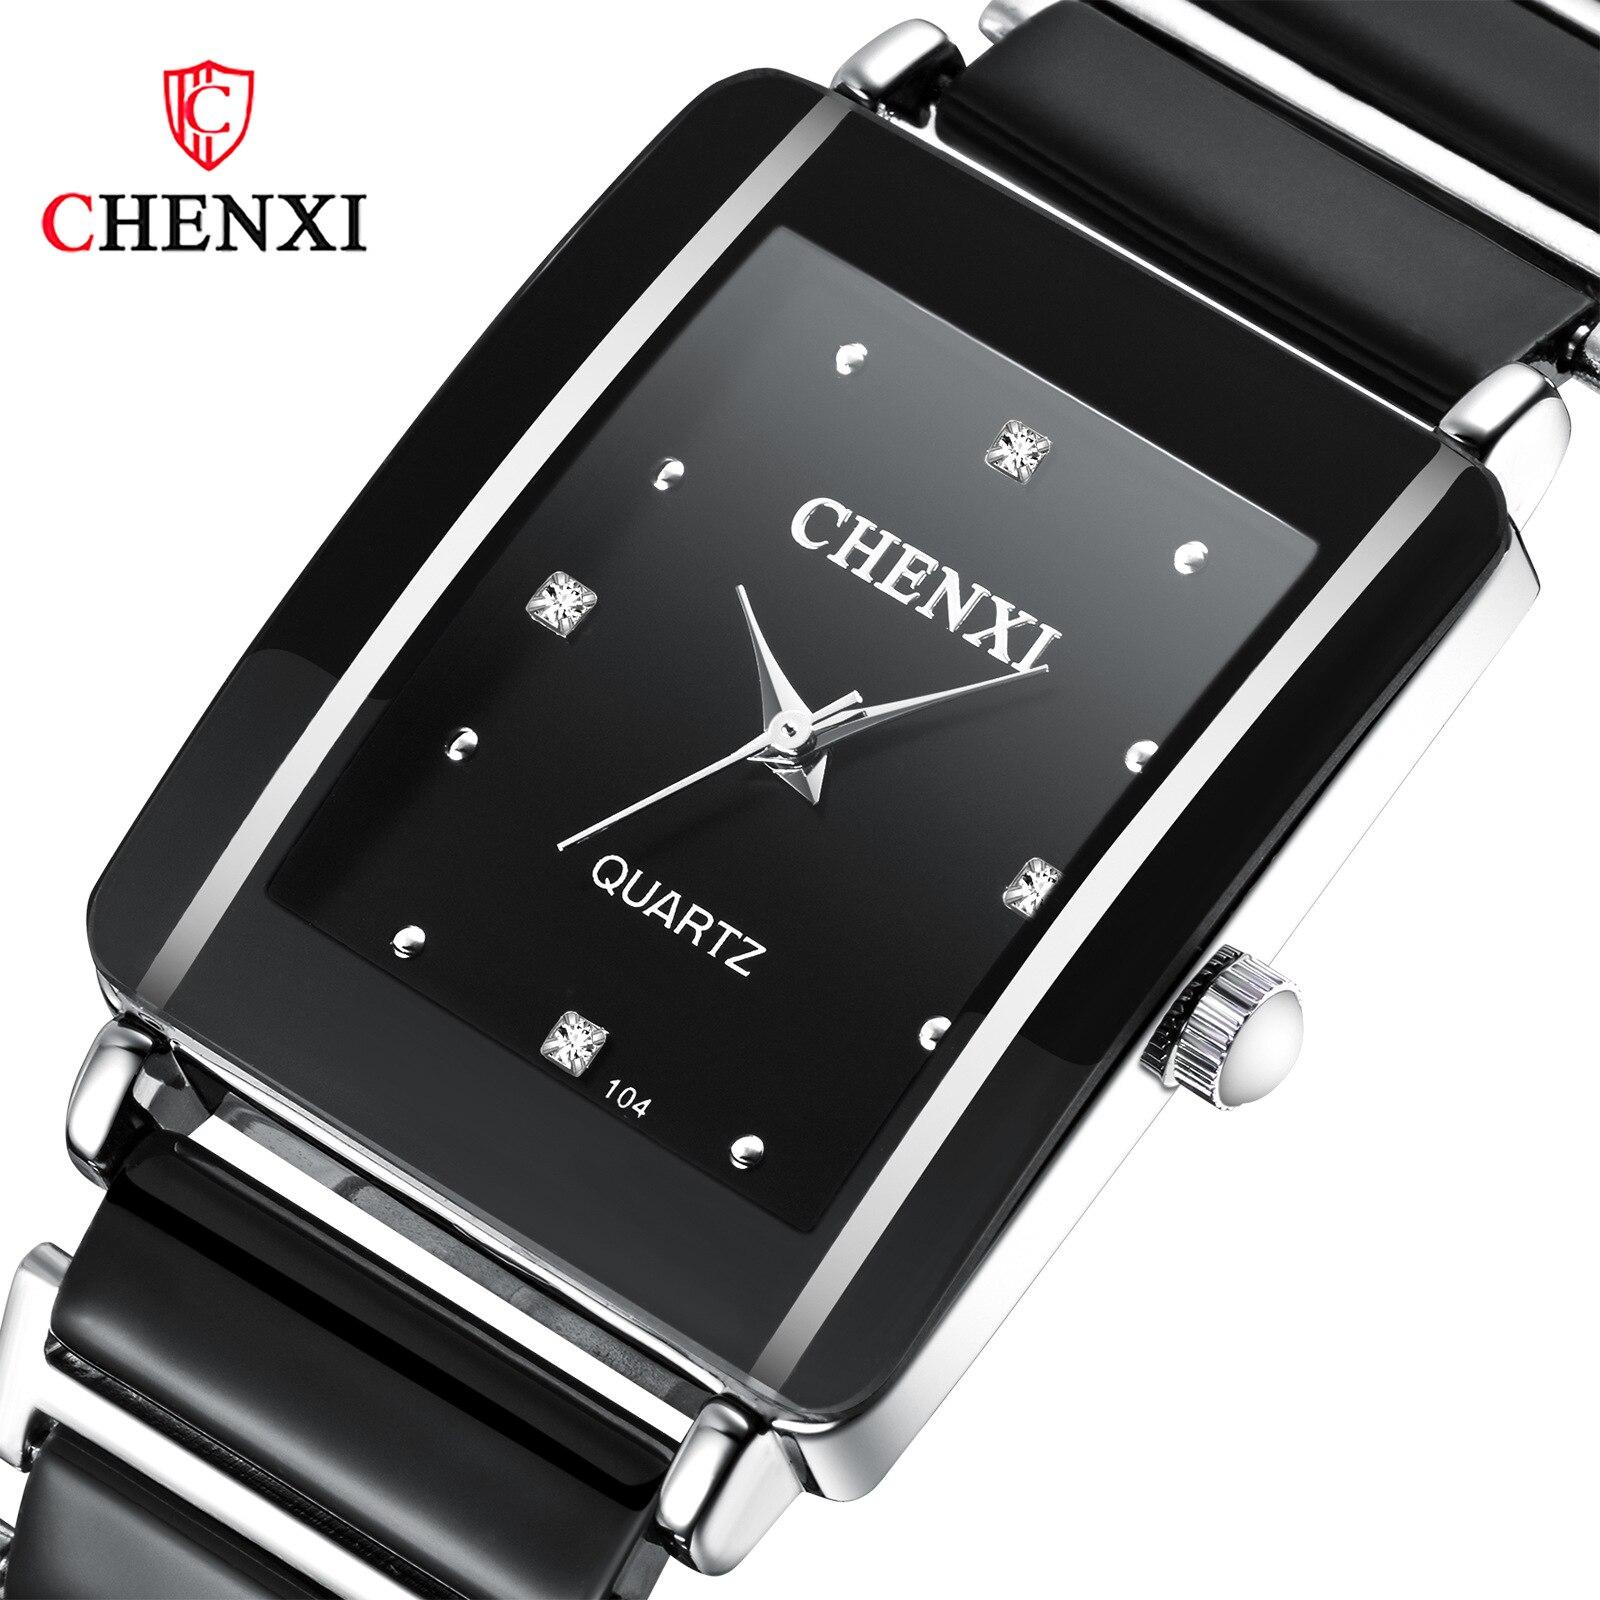 Relojes rectangulares de pareja de cerámica de cuarzo moda, relojes de moda cortos ultrafinos con reloj de pulsera de diamantes